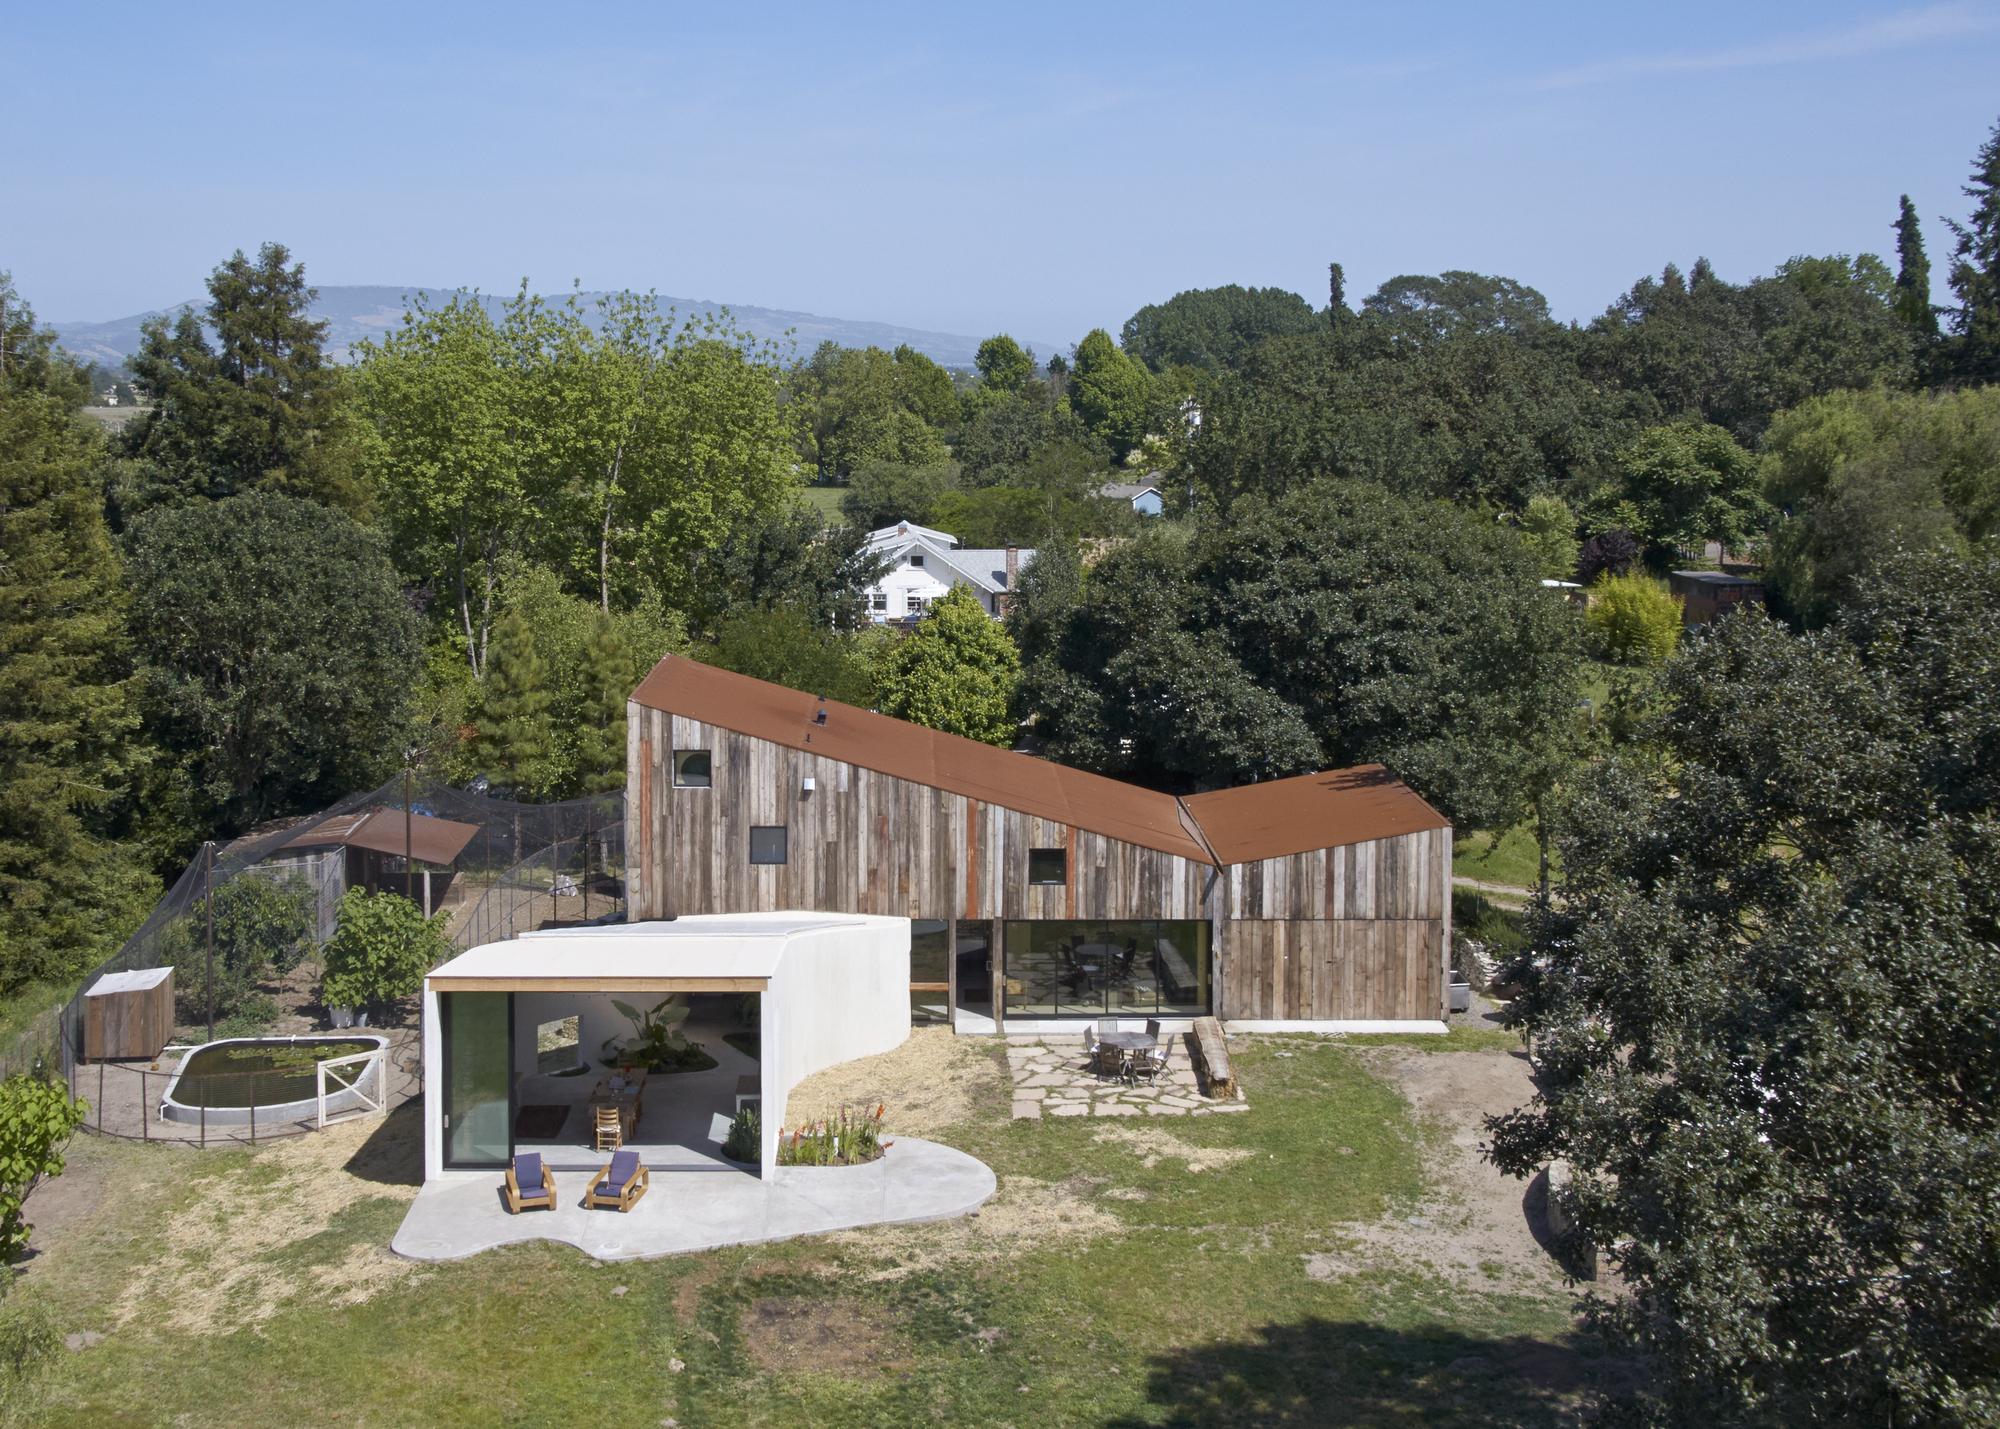 Gallery Of Artist Studio In Sonoma Mork Ulnes Architects 1